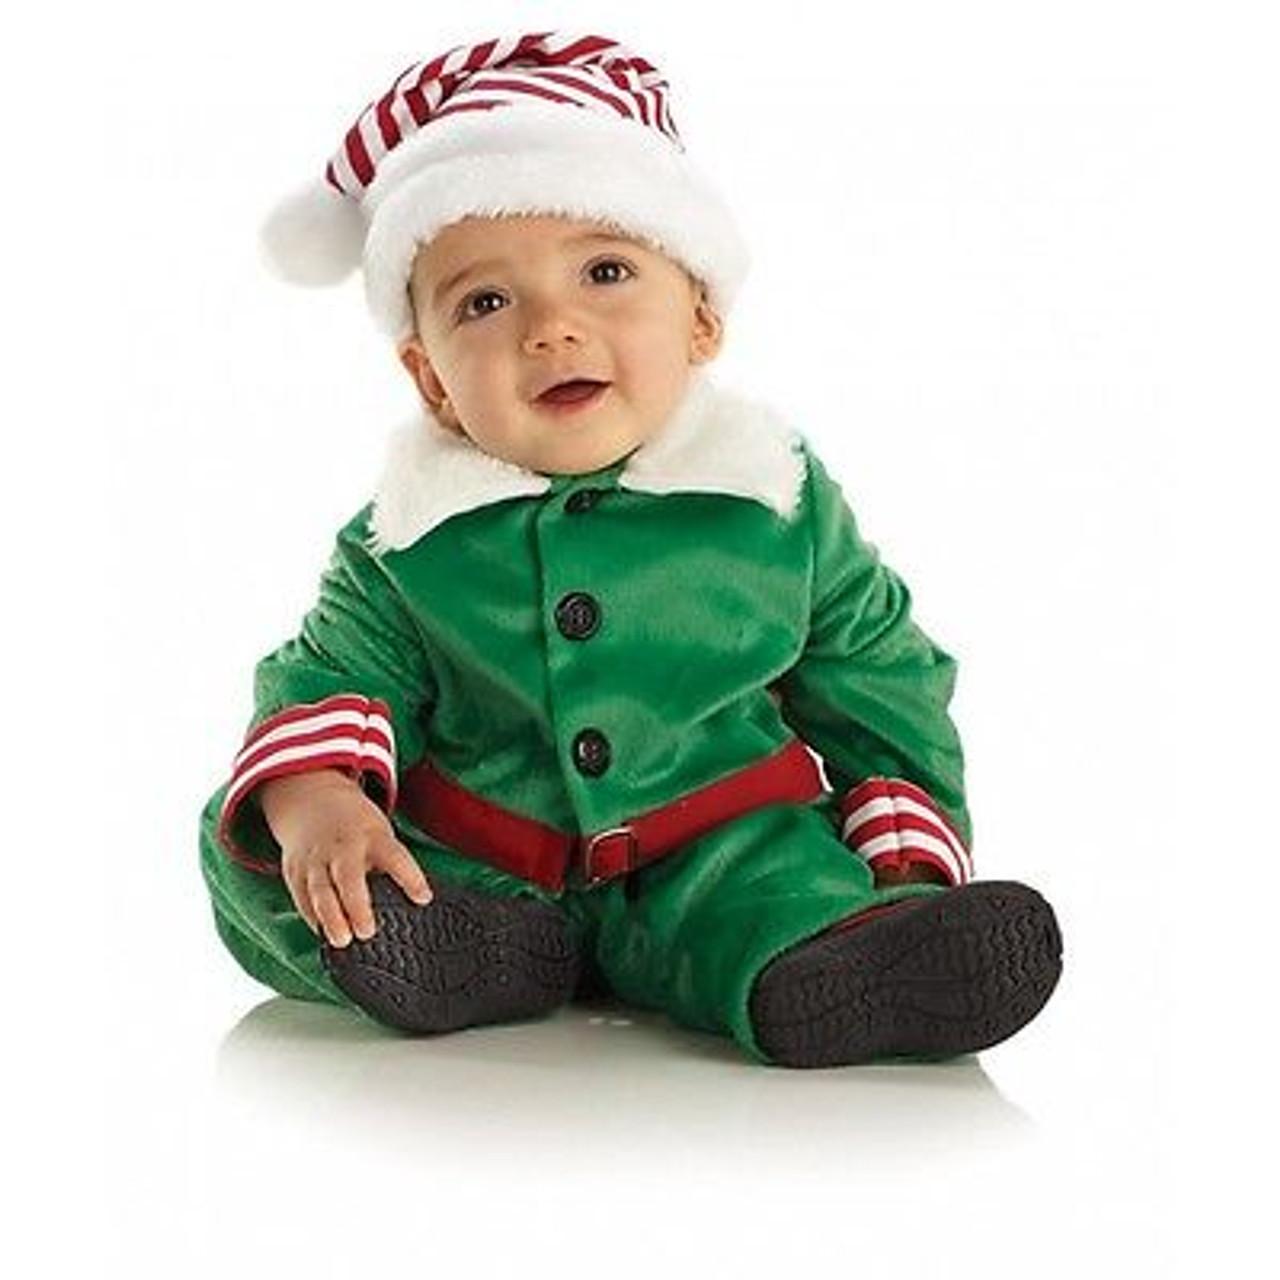 Underwraps Elf Holiday Santa Claus Christmas Xmas Toddler Baby Costume 26040